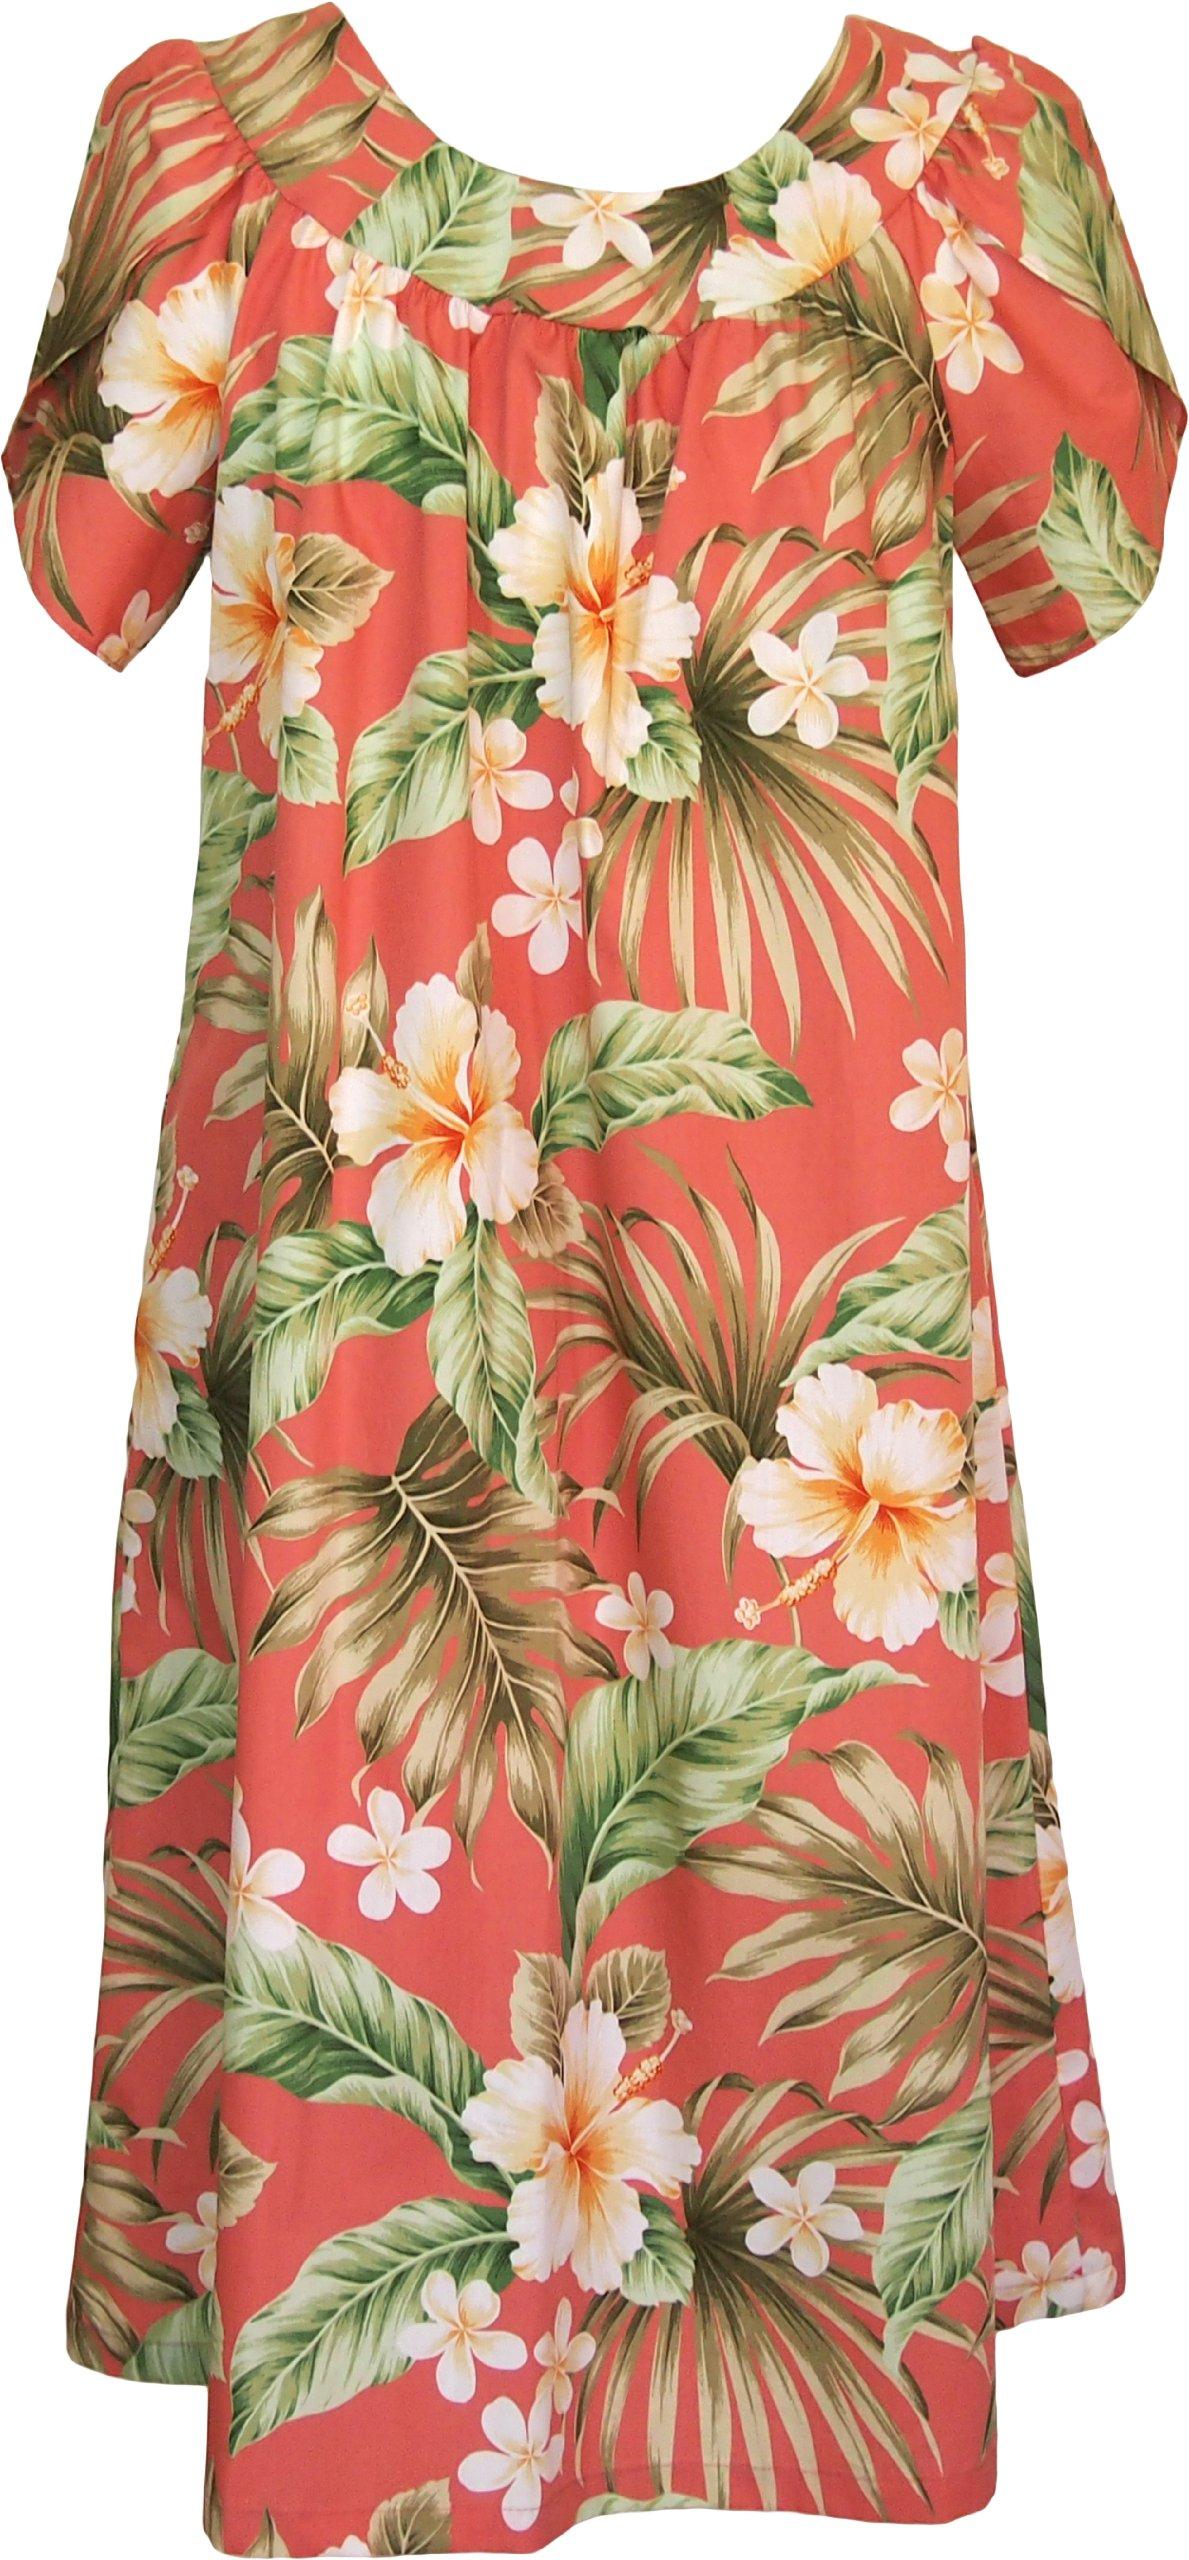 Available at Amazon: RJC Women's Full Bloom Muumuu Dress - Tea Length